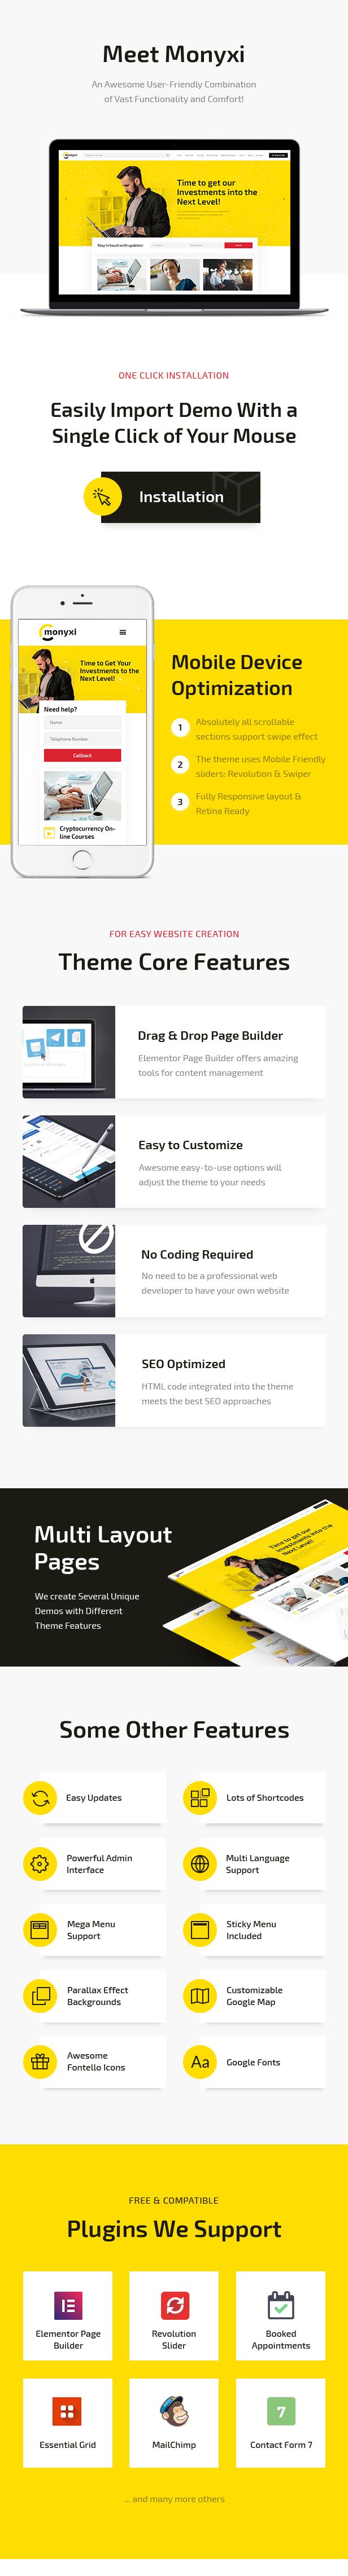 Monyxi | Cryptocurrency Trading Business Coach WordPress Theme - 1